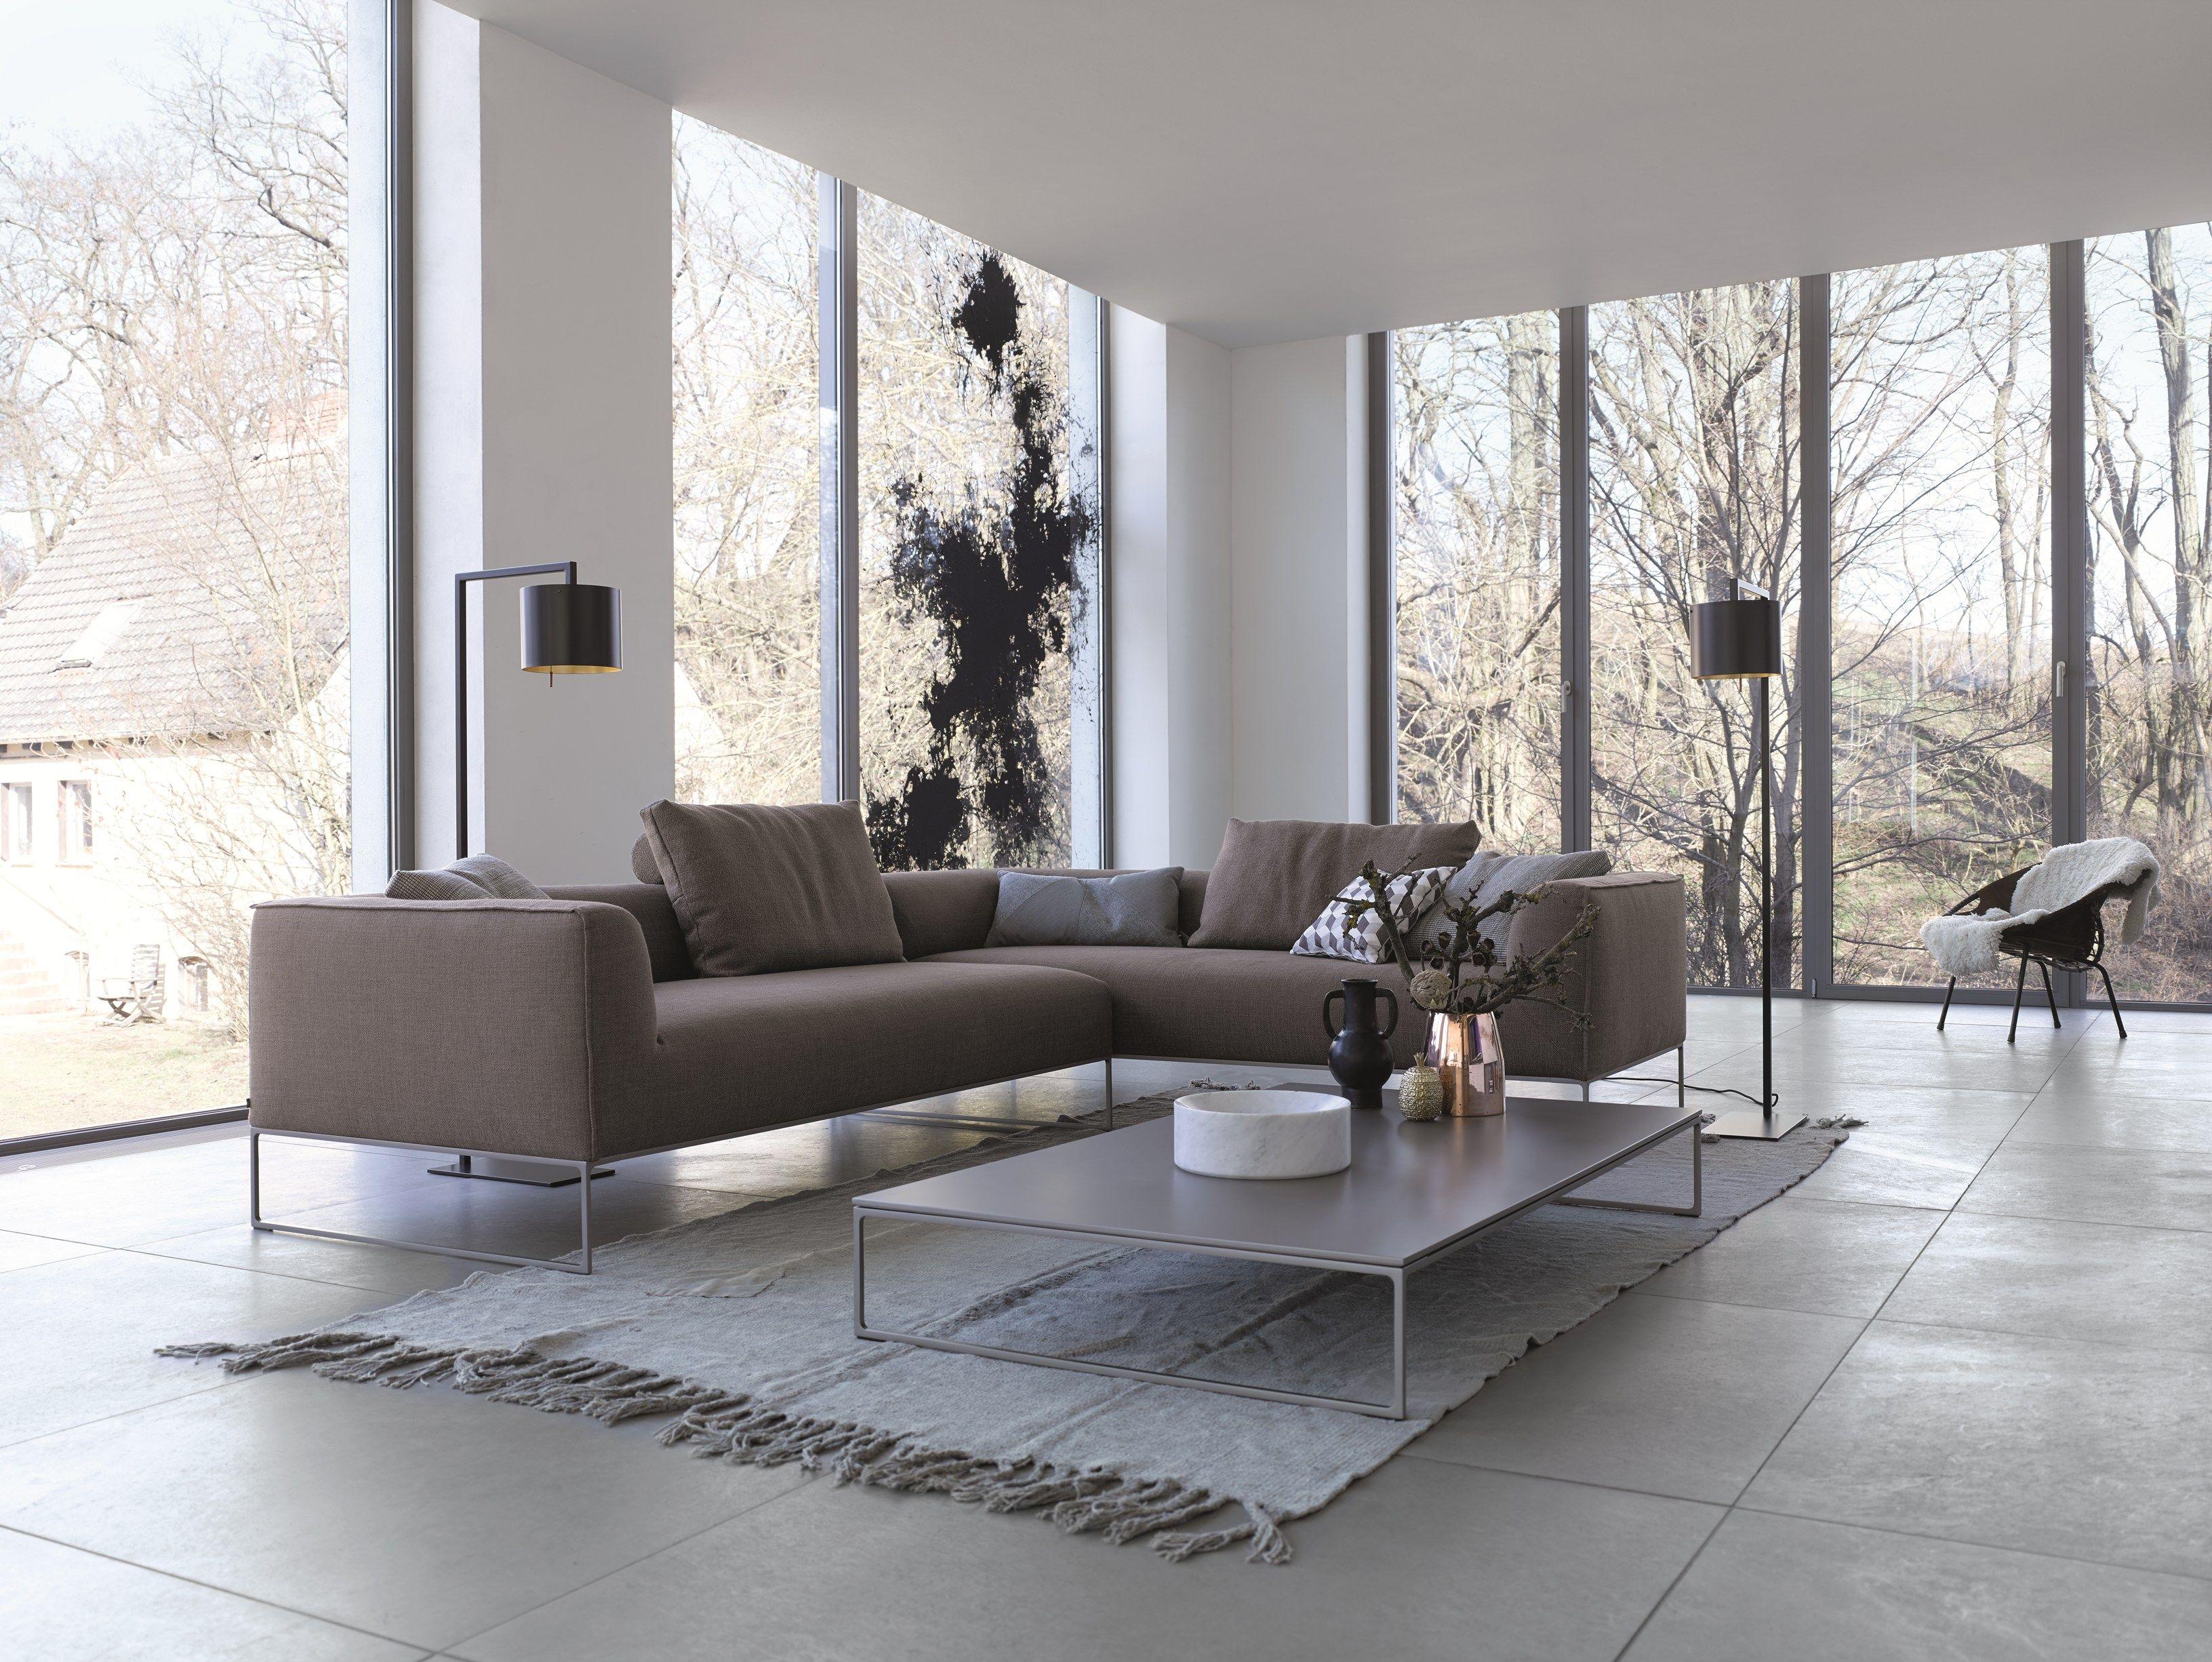 MELL LOUNGE Anbausofa by COR Sitzmöbel Helmut Lübke Design Jehs